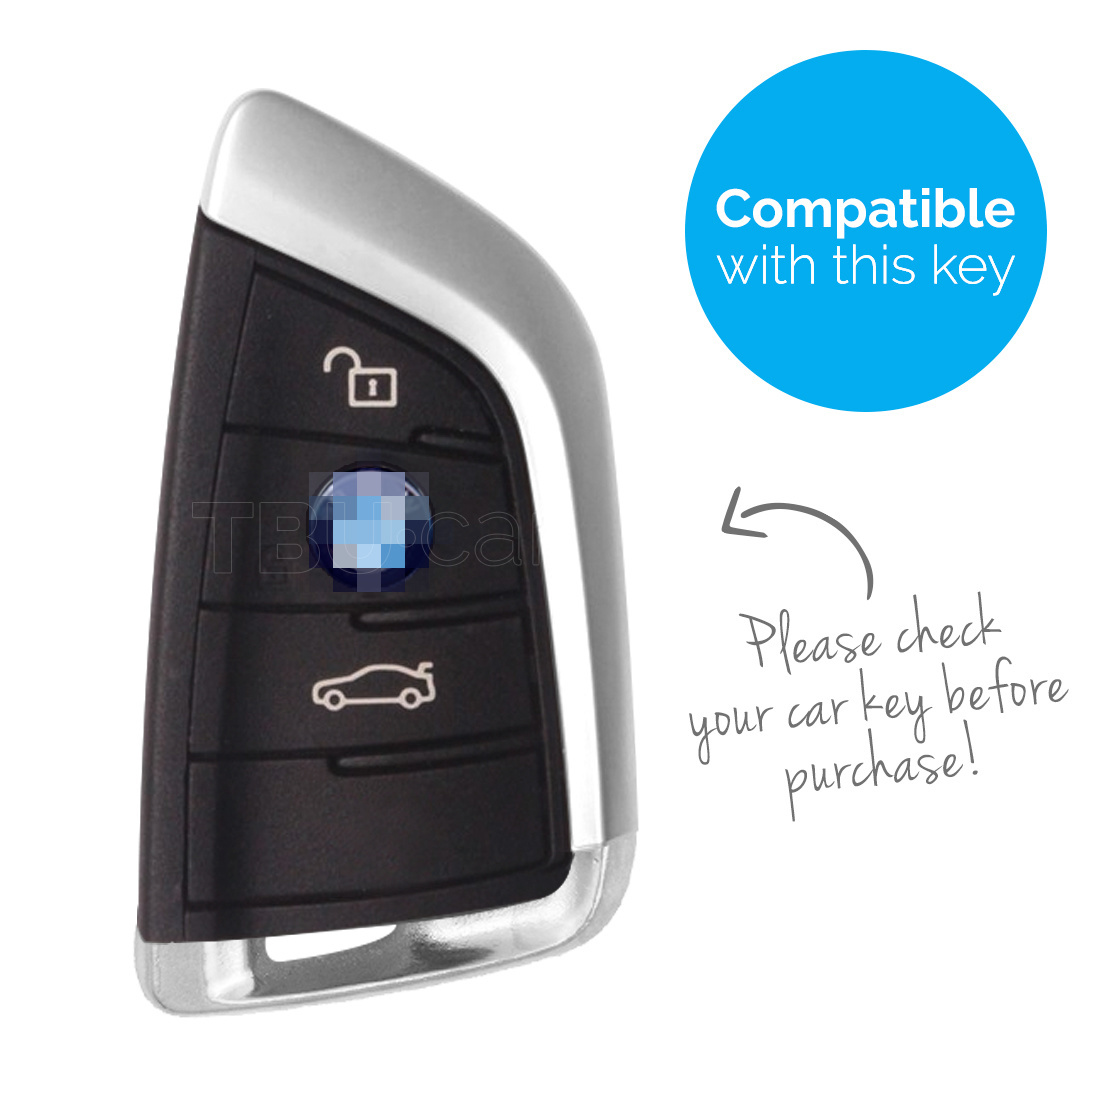 TBU car TBU car Autoschlüssel Hülle kompatibel mit BMW 3 Tasten (Keyless Entry) - Schutzhülle aus Silikon - Auto Schlüsselhülle Cover in Schwarz